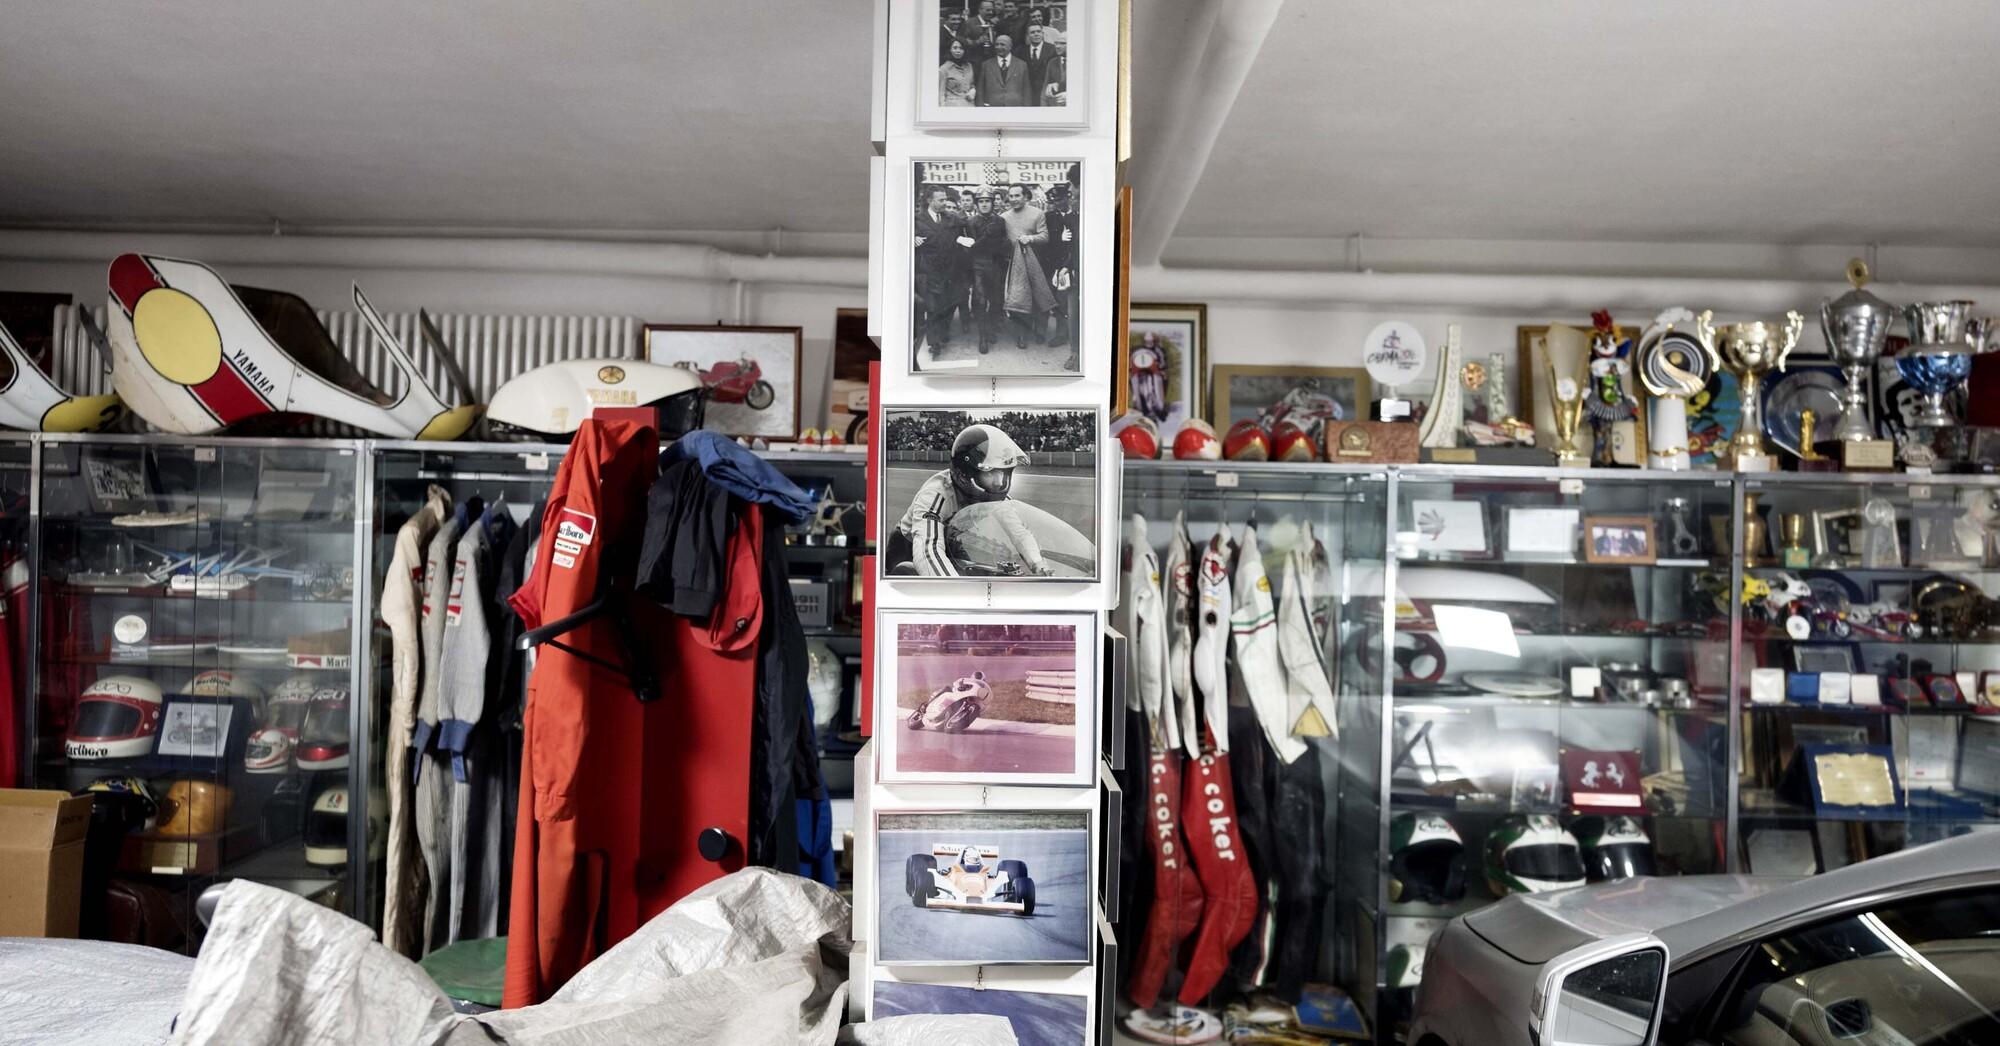 Tute appese, trofei, foto, auto: il garage di Giacomo Agostini (Photo by Gabriele Micalizzi)